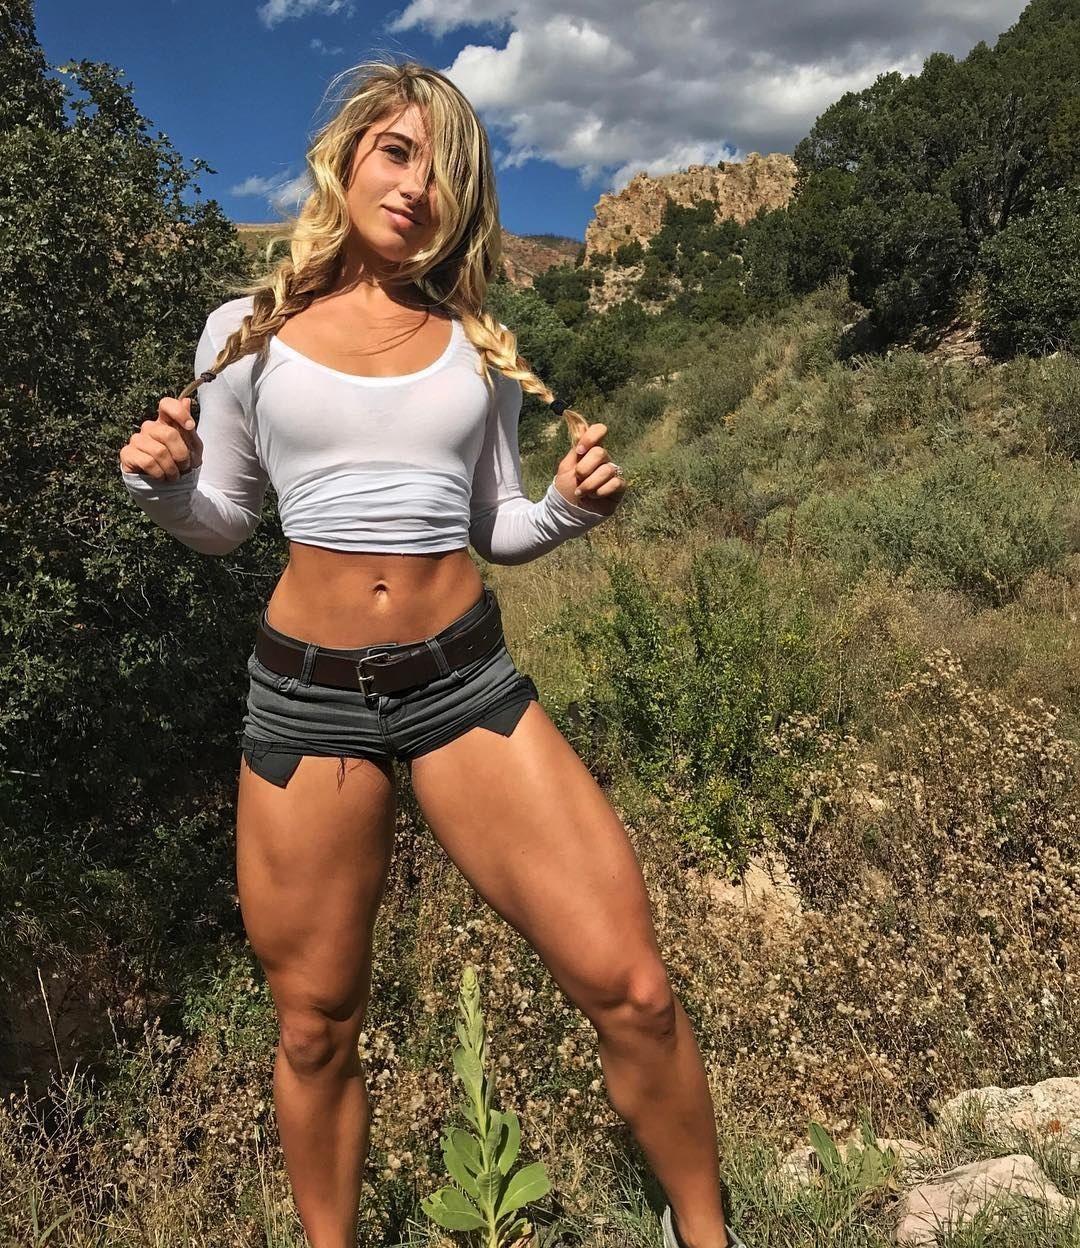 Sexy female athletes tumblr